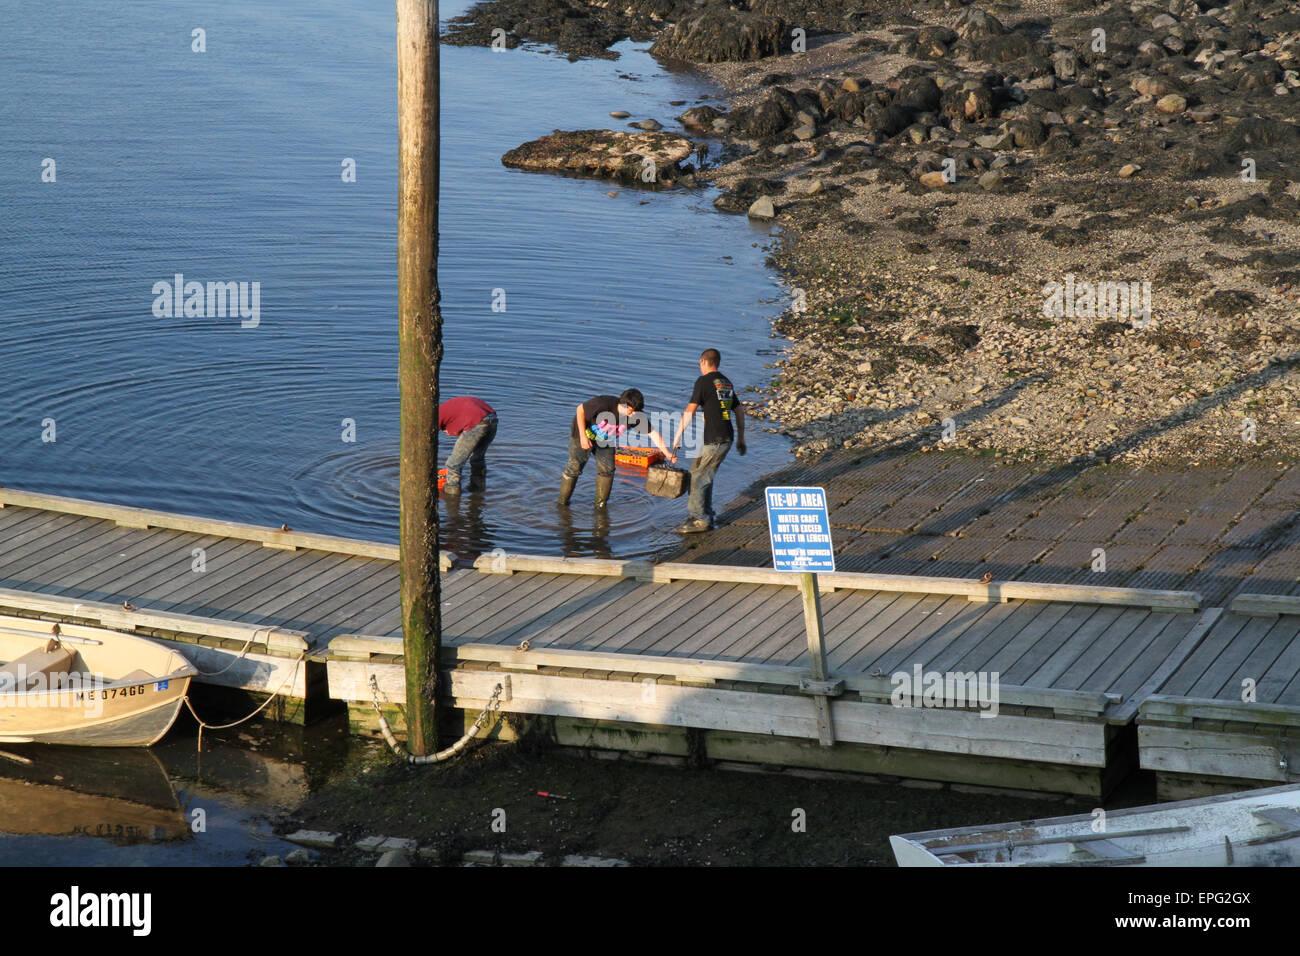 Collecting and rinsing shellfish - Stock Image